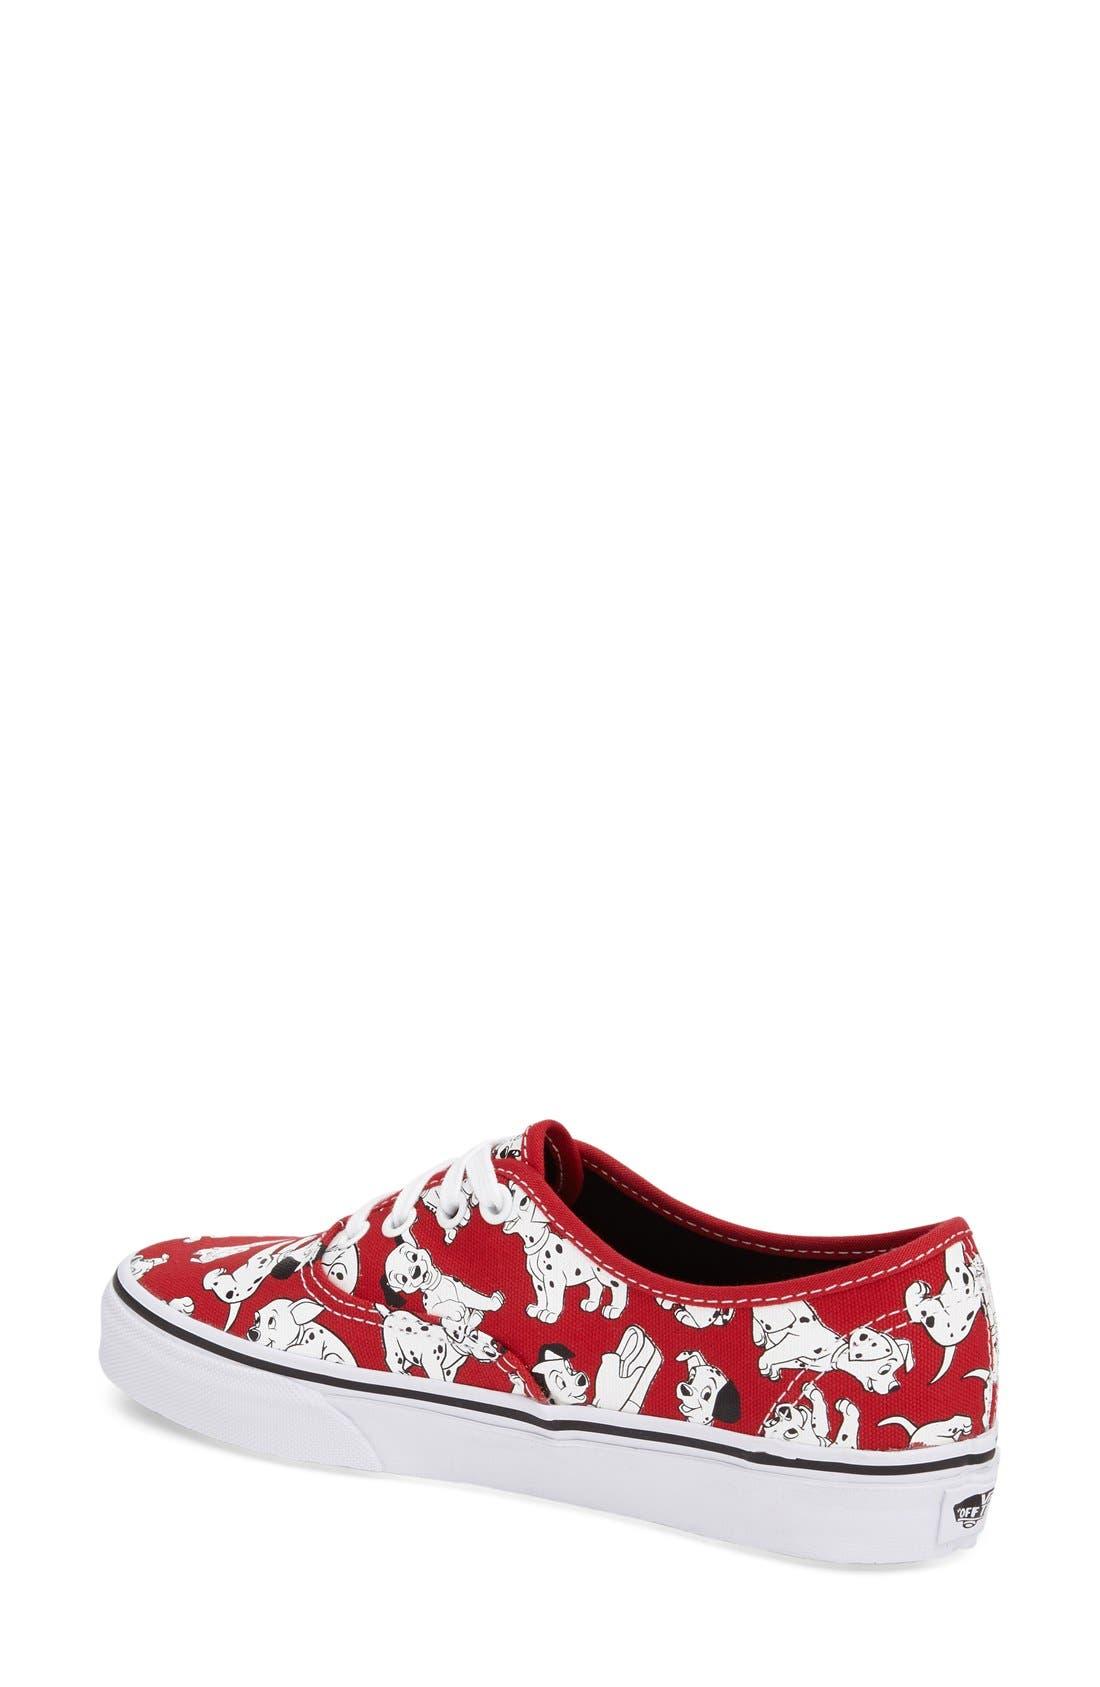 Alternate Image 2  - Vans 'Authentic - Disney® 101 Dalmatians®' Sneaker (Women)